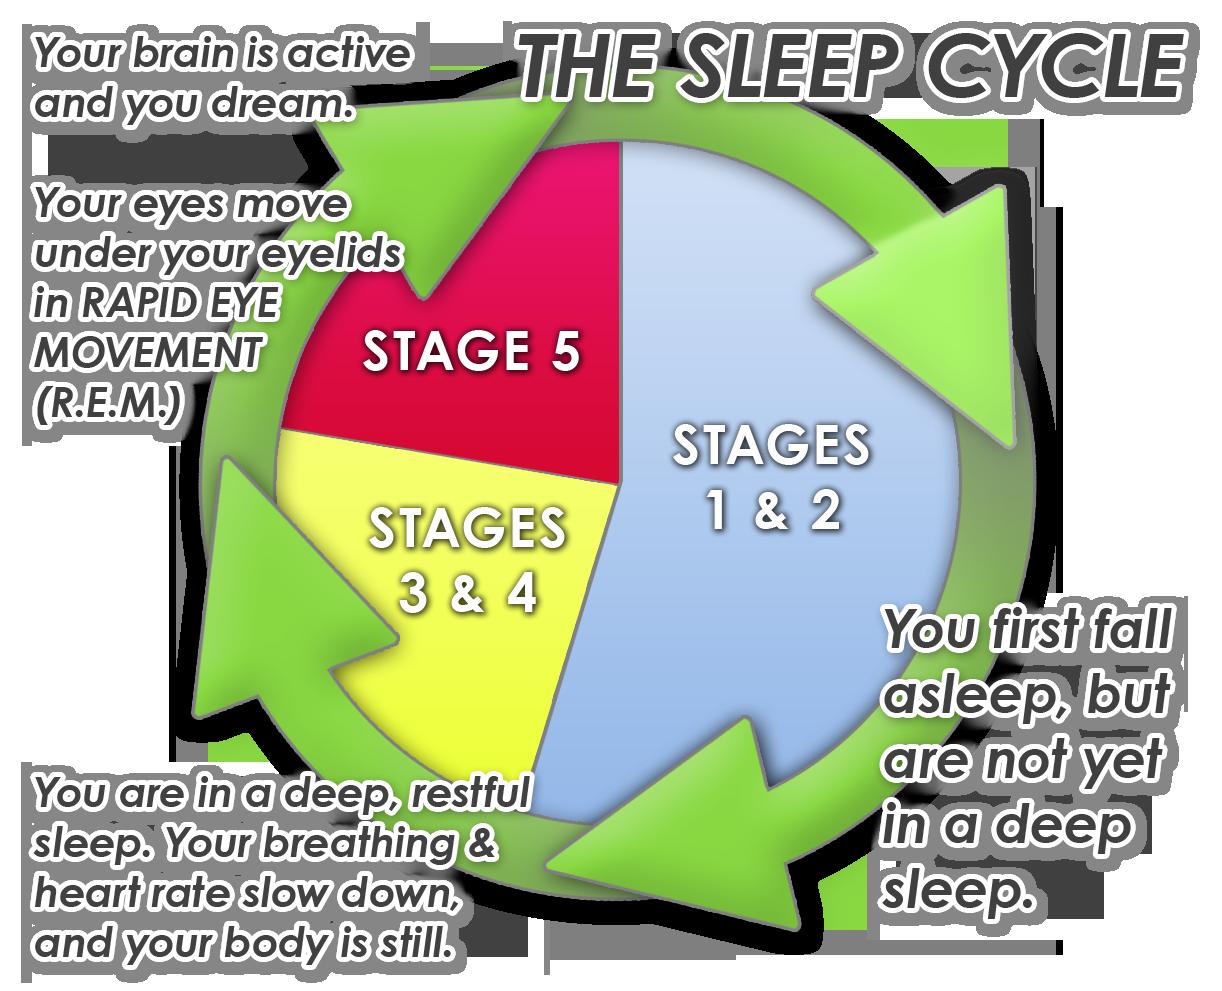 Sleep-cycle-graphic.png